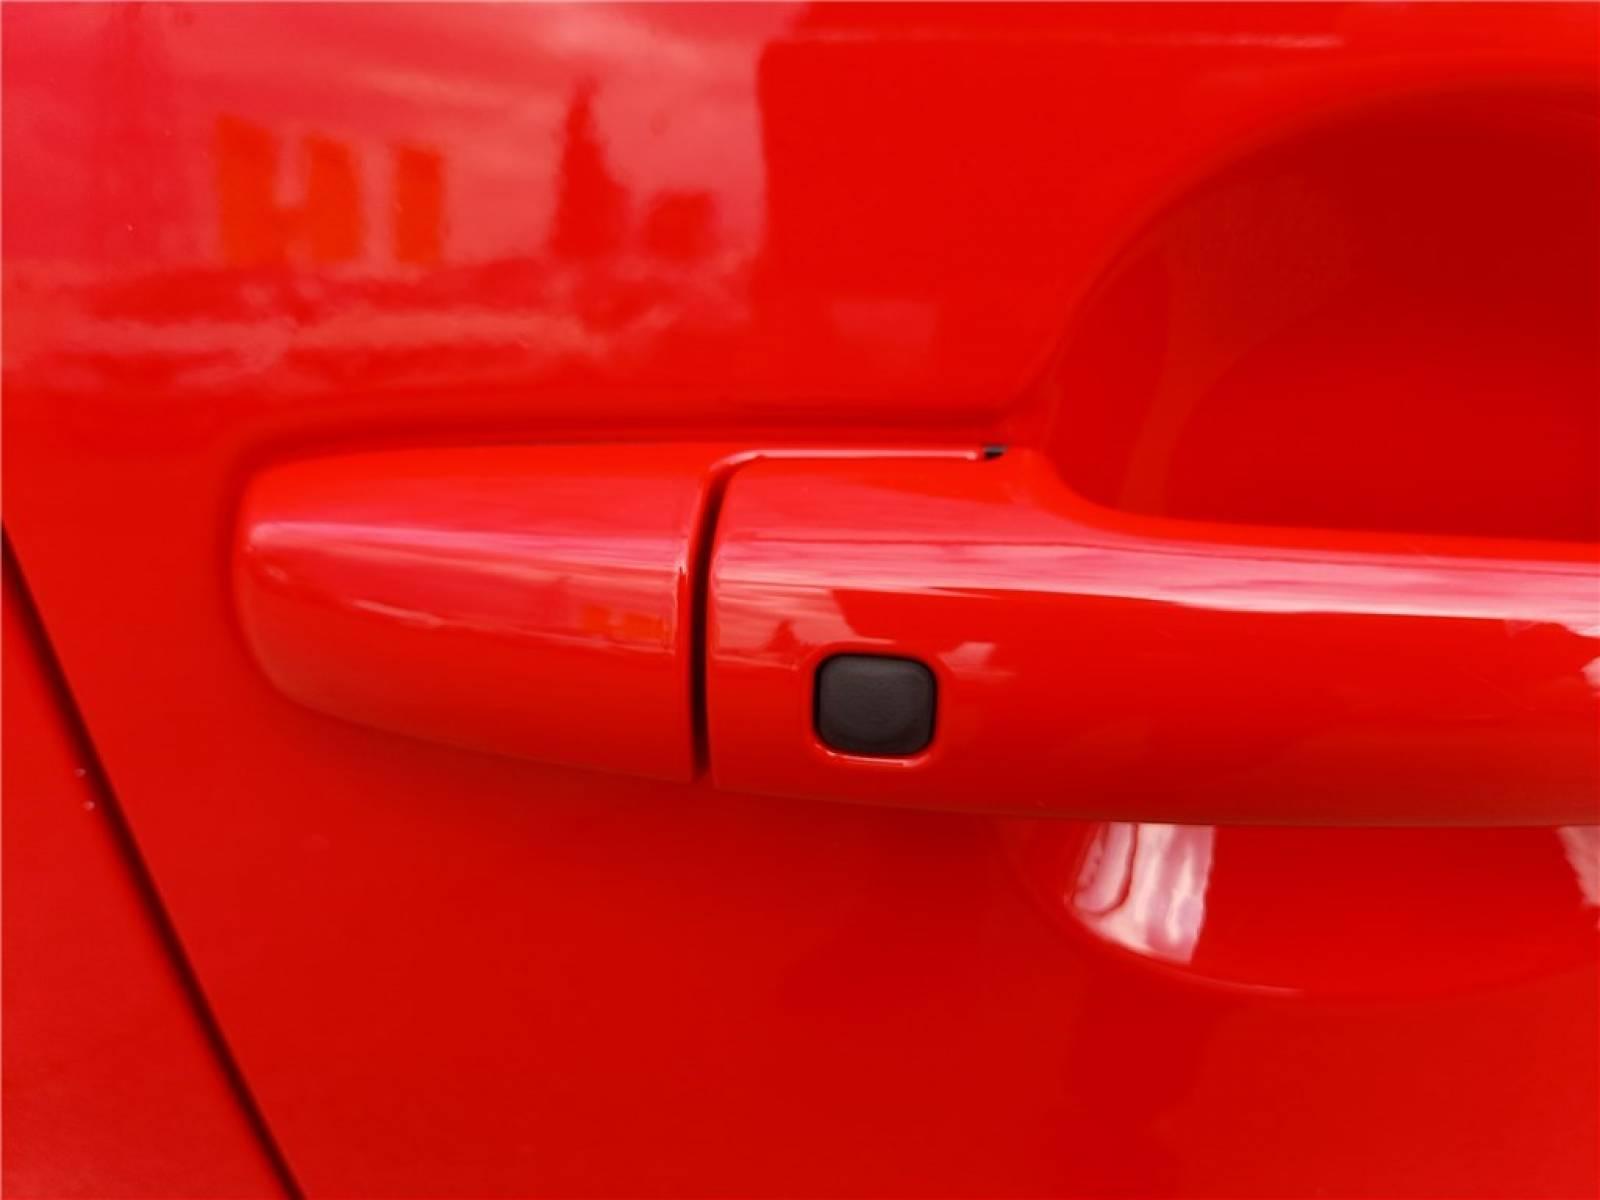 SUZUKI Ignis 1.2 Dualjet Auto (AGS) - véhicule d'occasion - Groupe Guillet - Opel Magicauto - Chalon-sur-Saône - 71380 - Saint-Marcel - 18